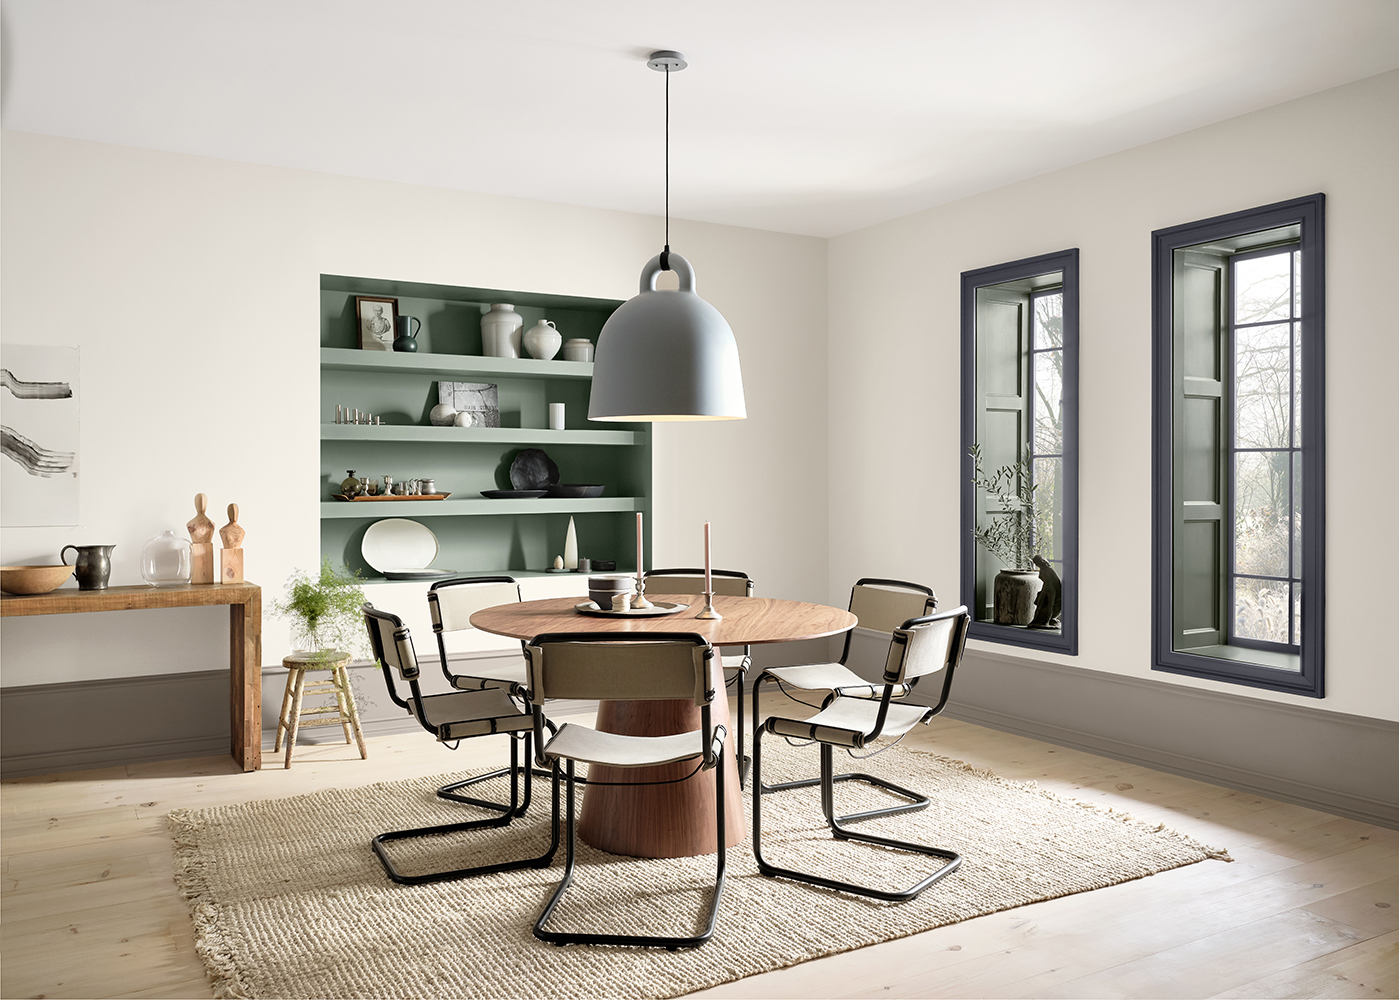 Dining room design in Haven